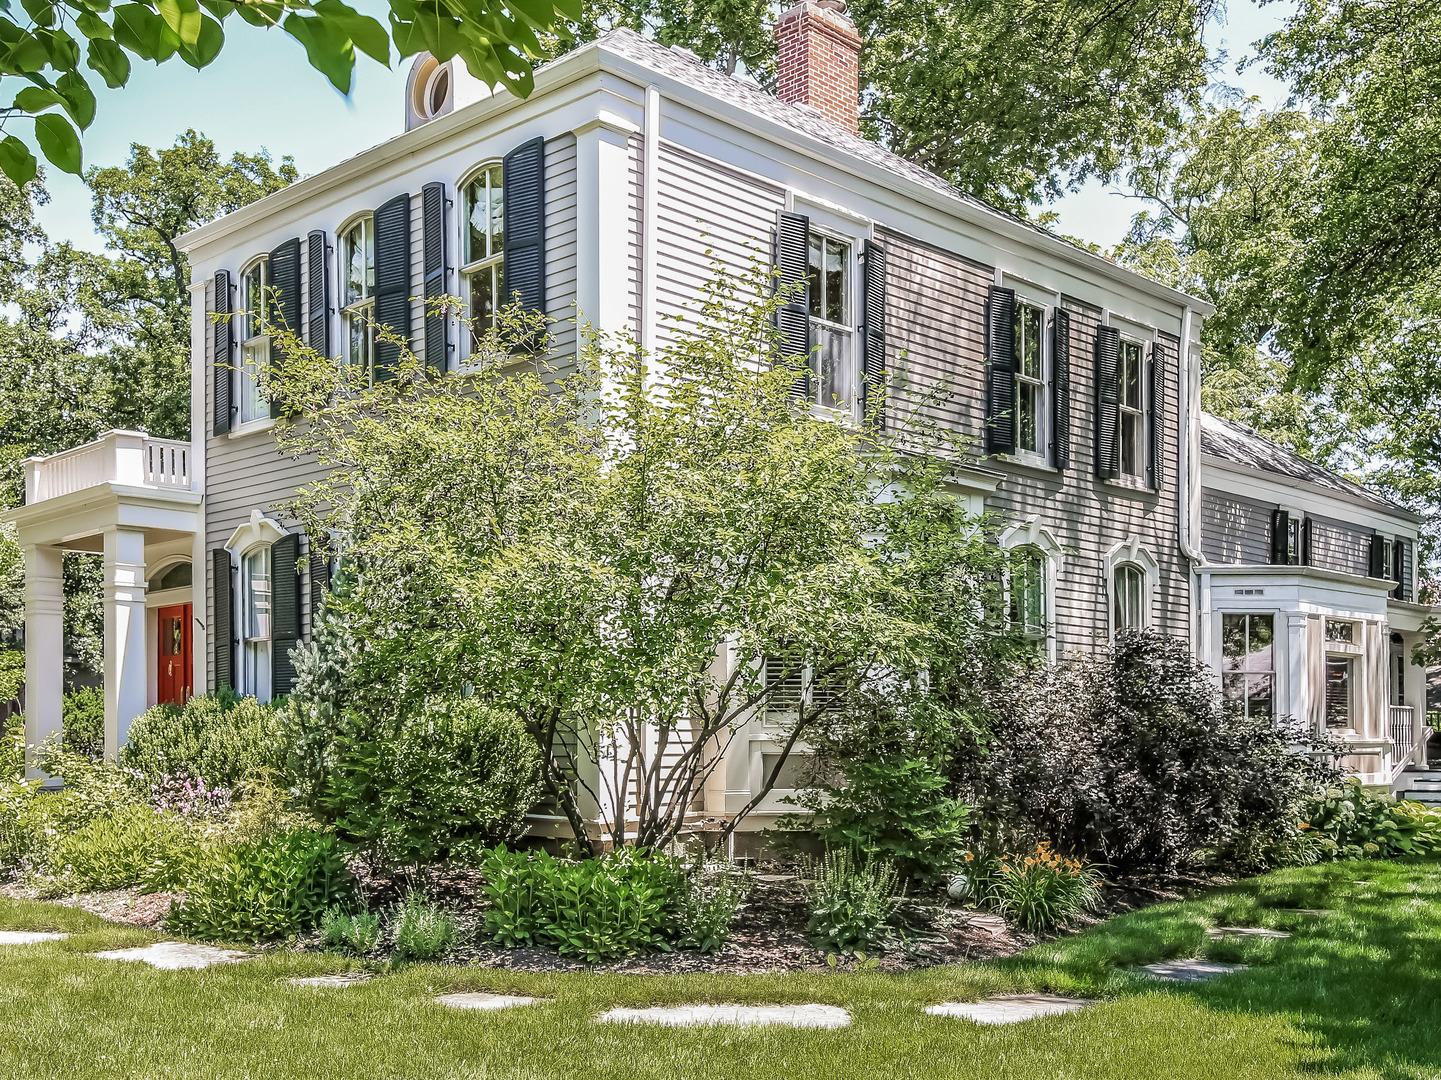 434 North East Avenue, Oak Park, Illinois